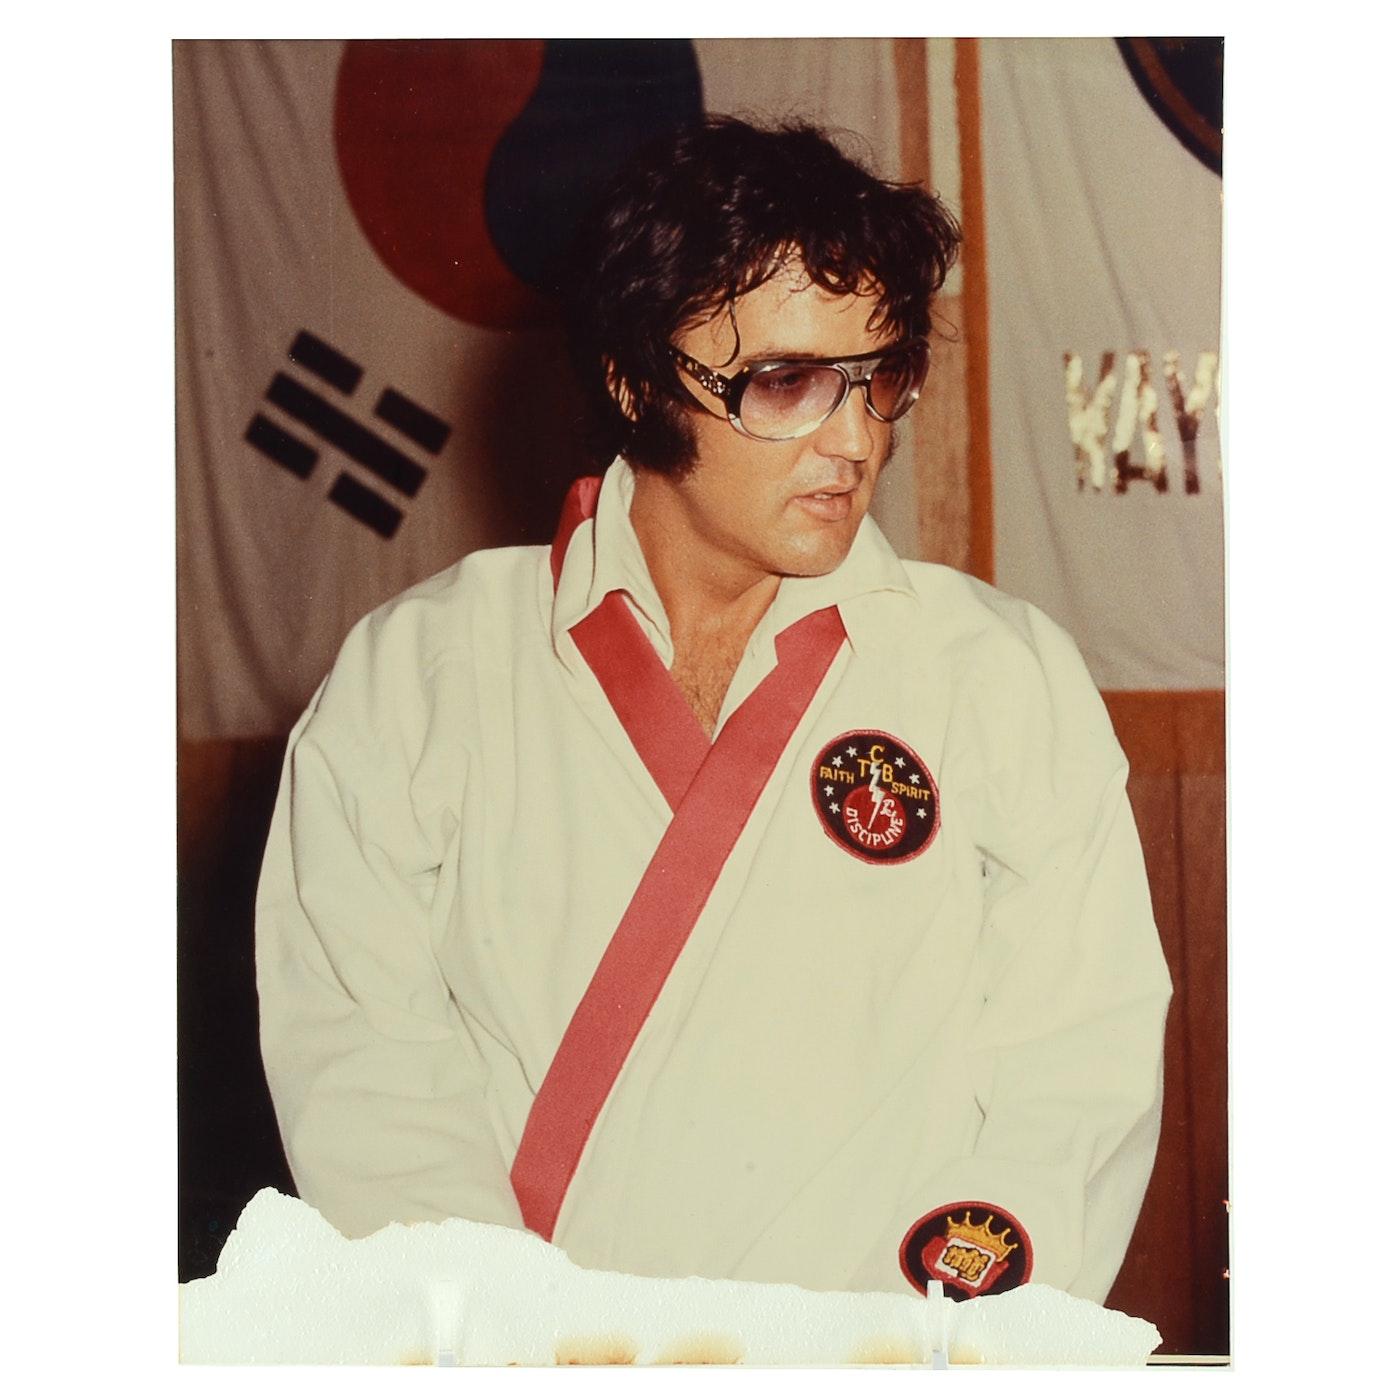 1970s Vintage Color Photograph Of Elvis Presley Wearing